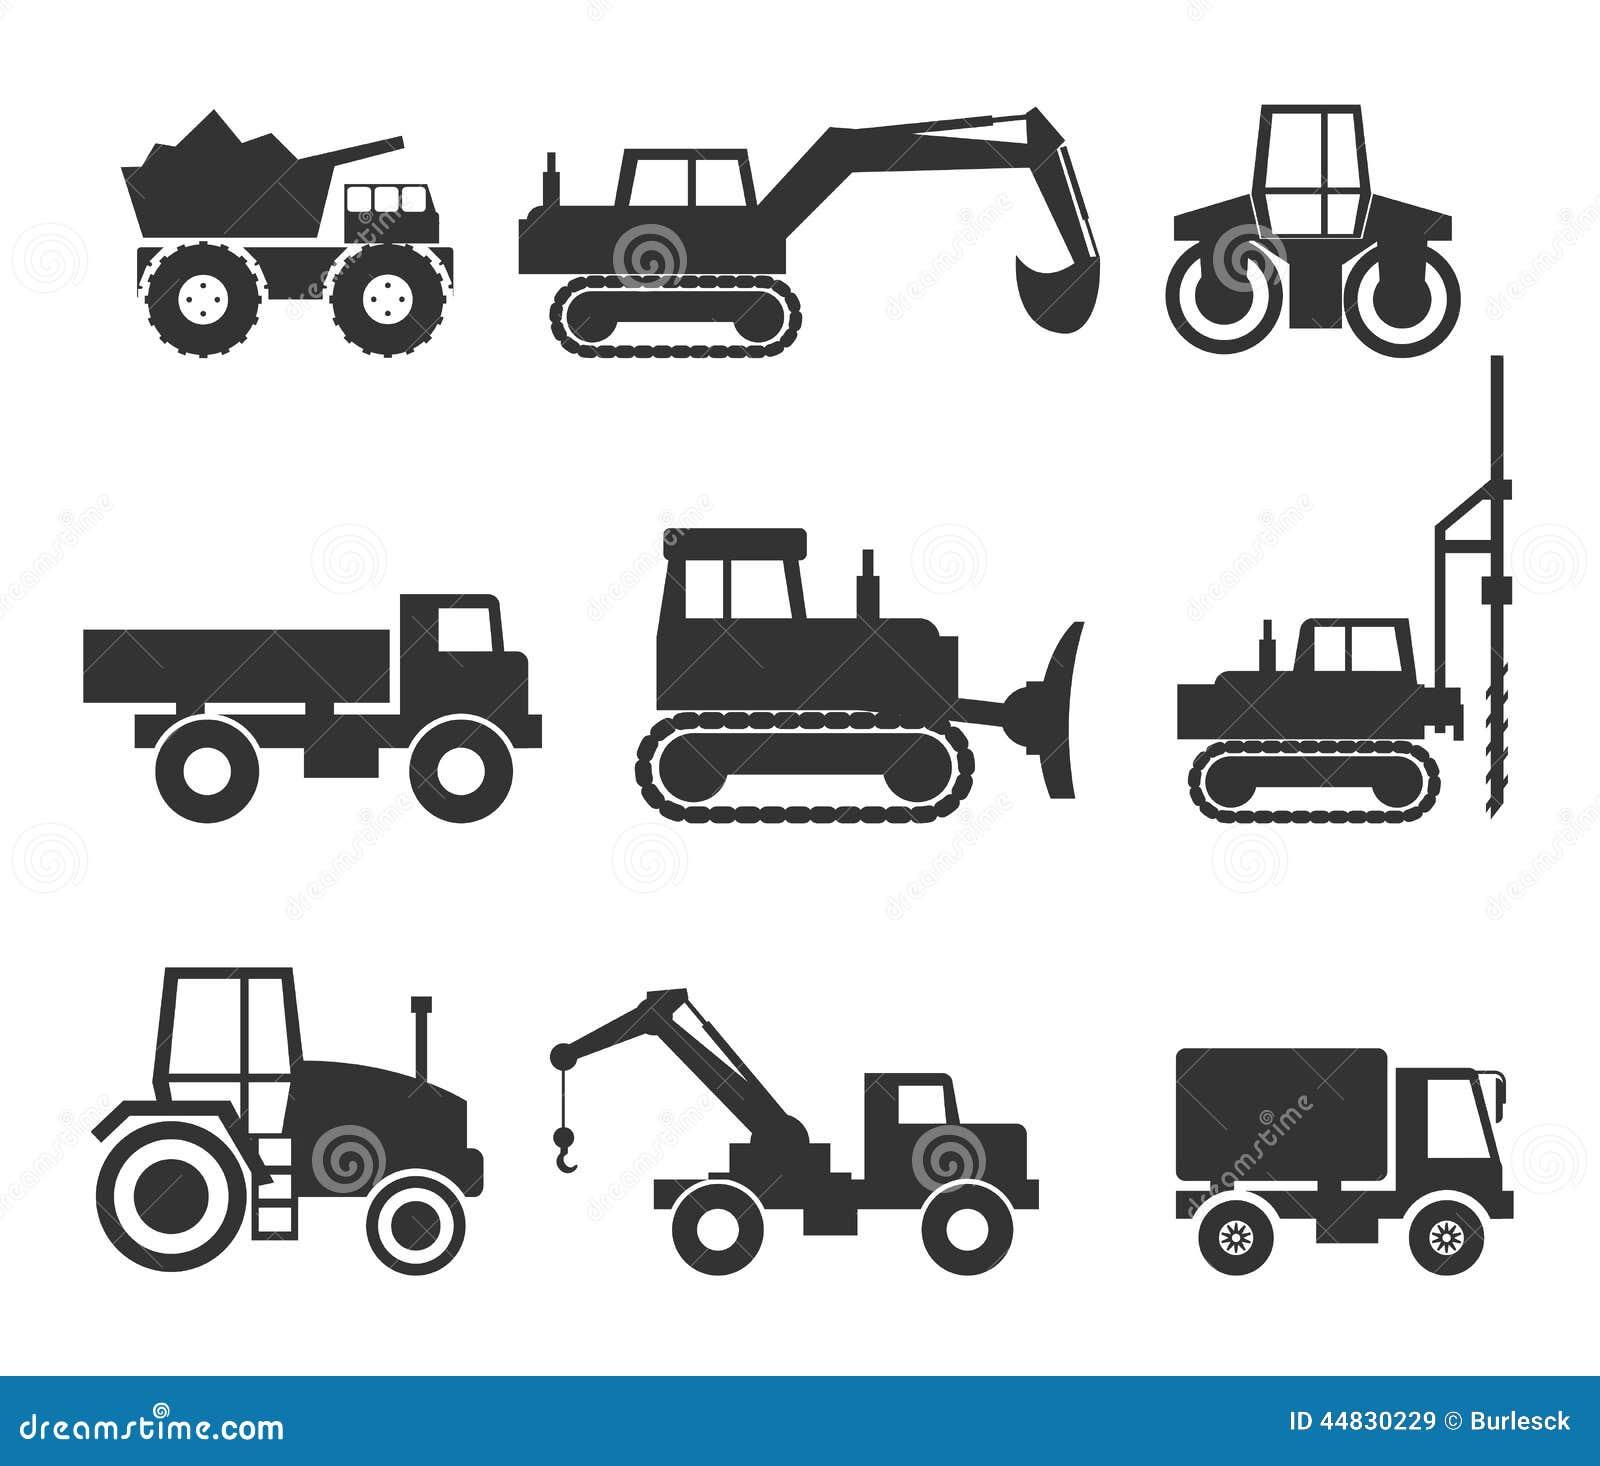 Construction Machinery Icon Symbol Graphics